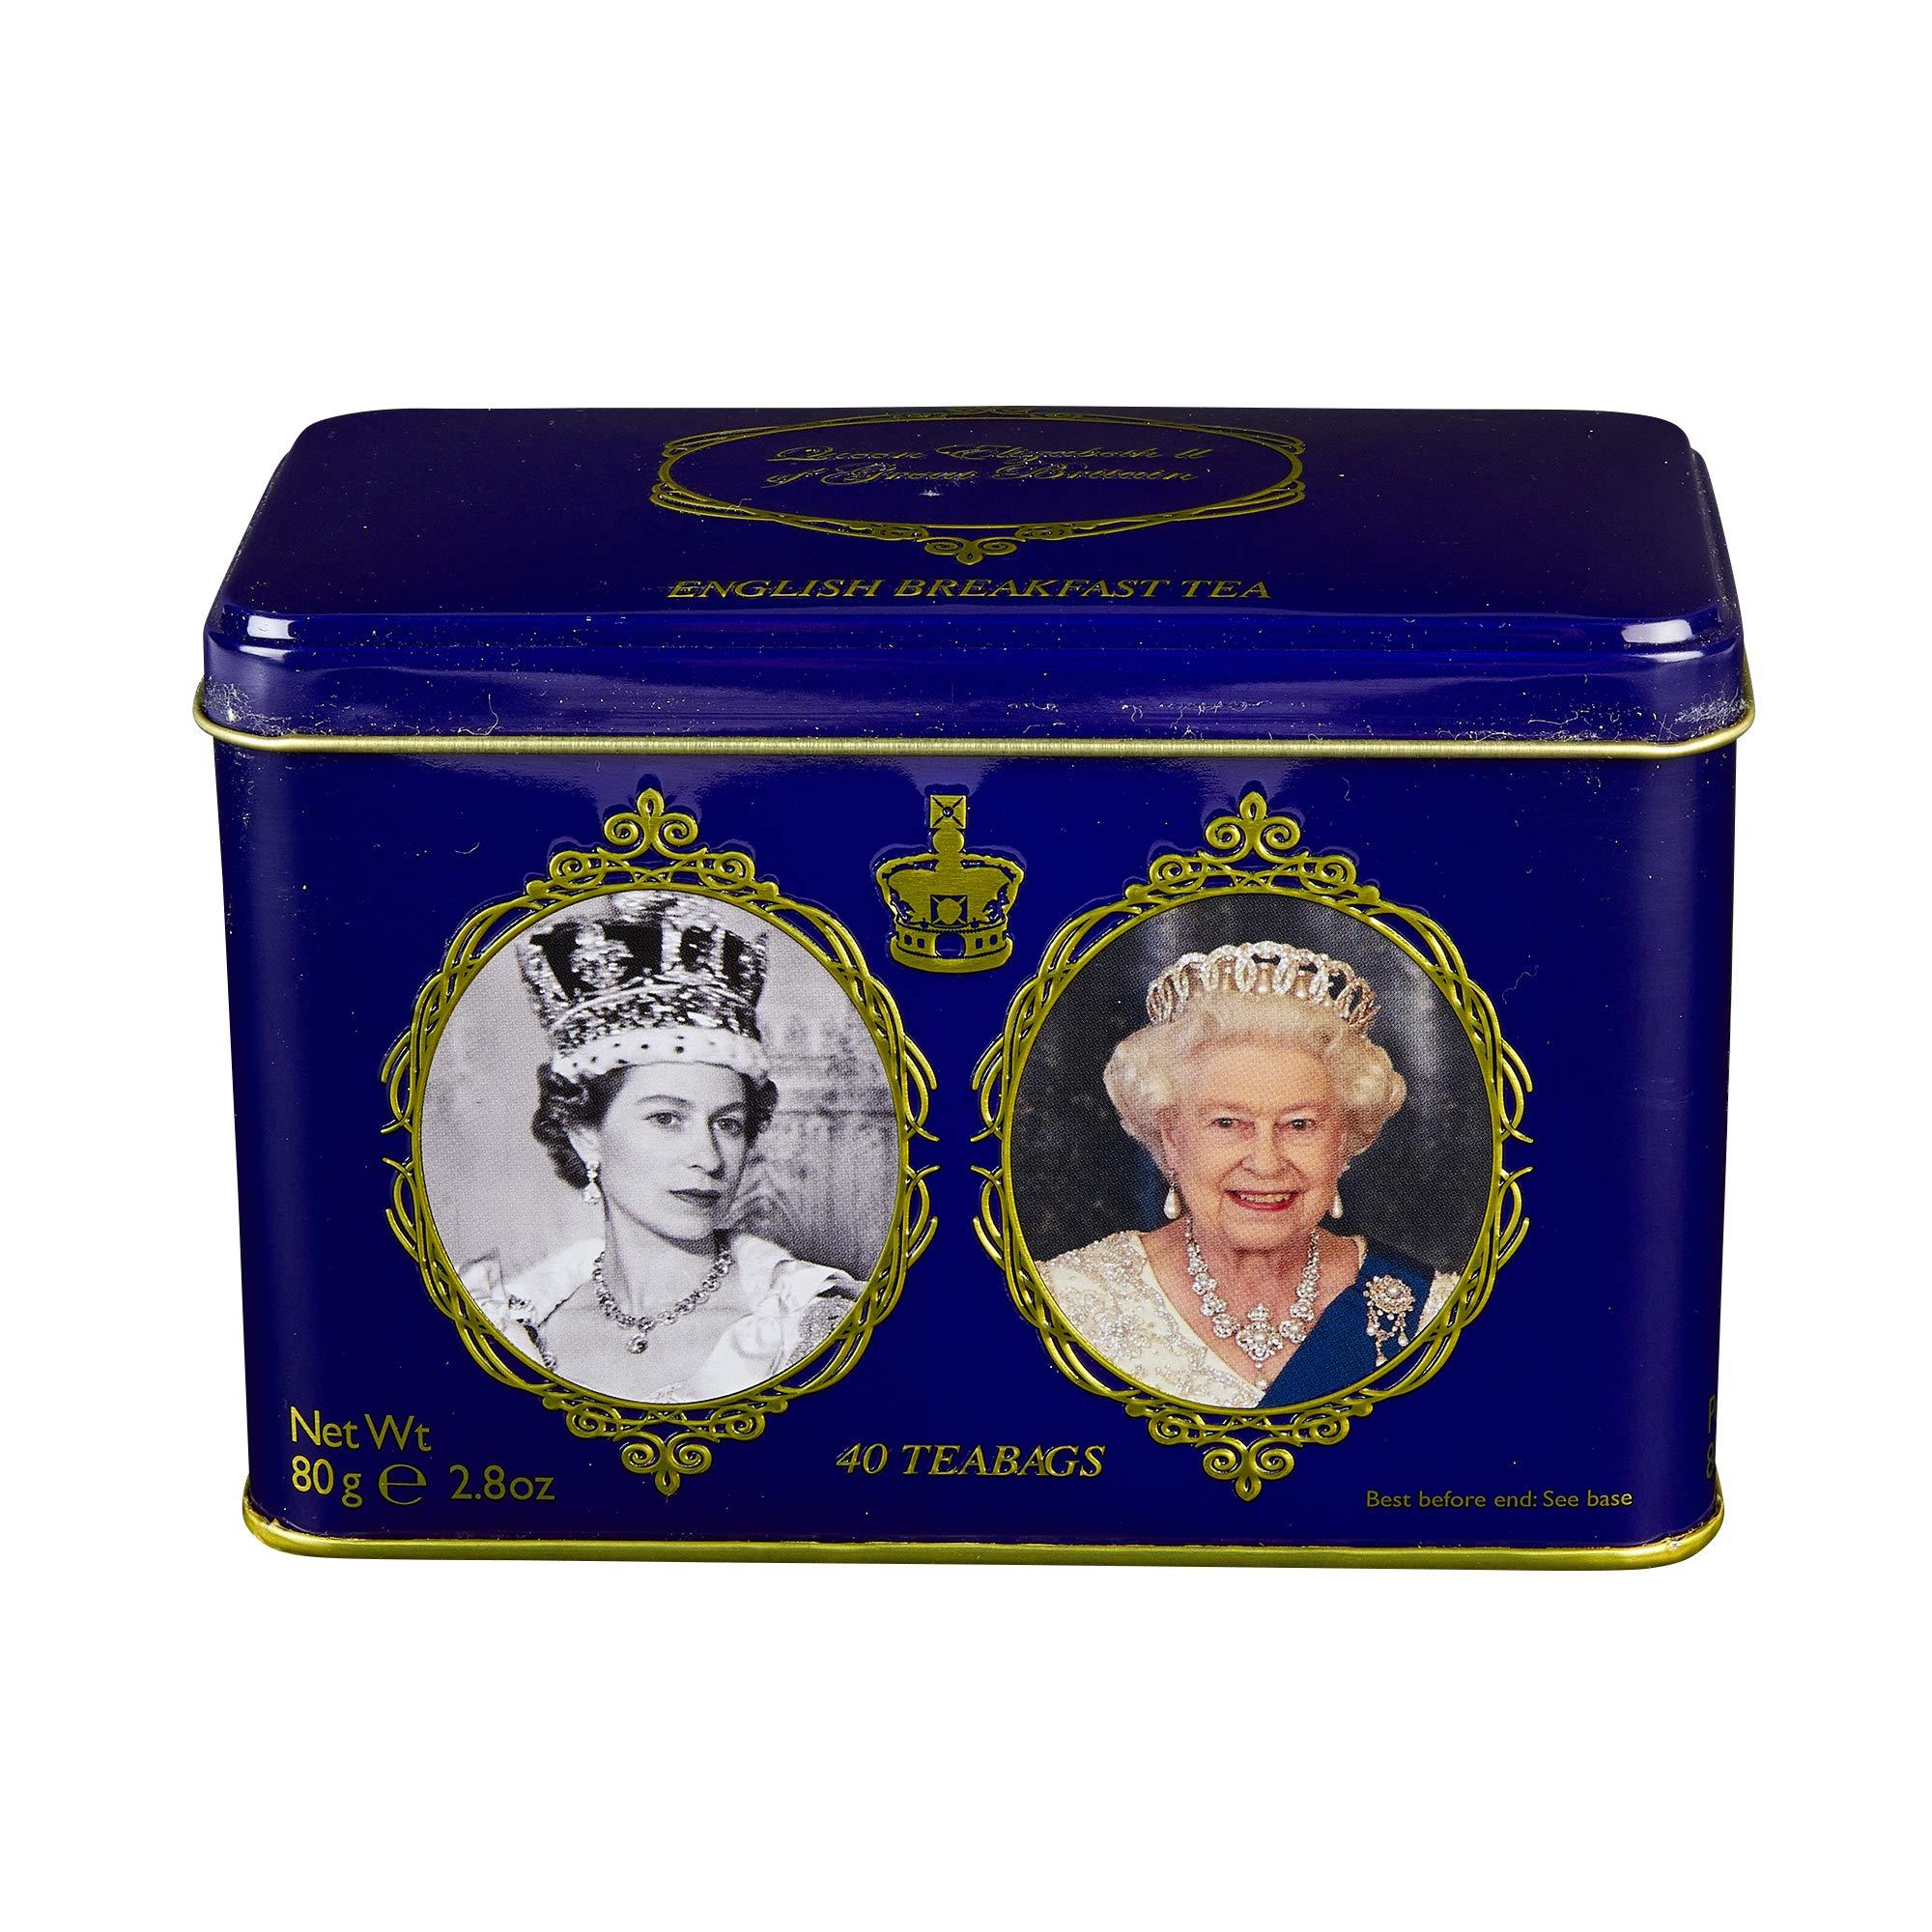 New English Teas Queen Elizabeth II Tin 80 g (40 Teabags)